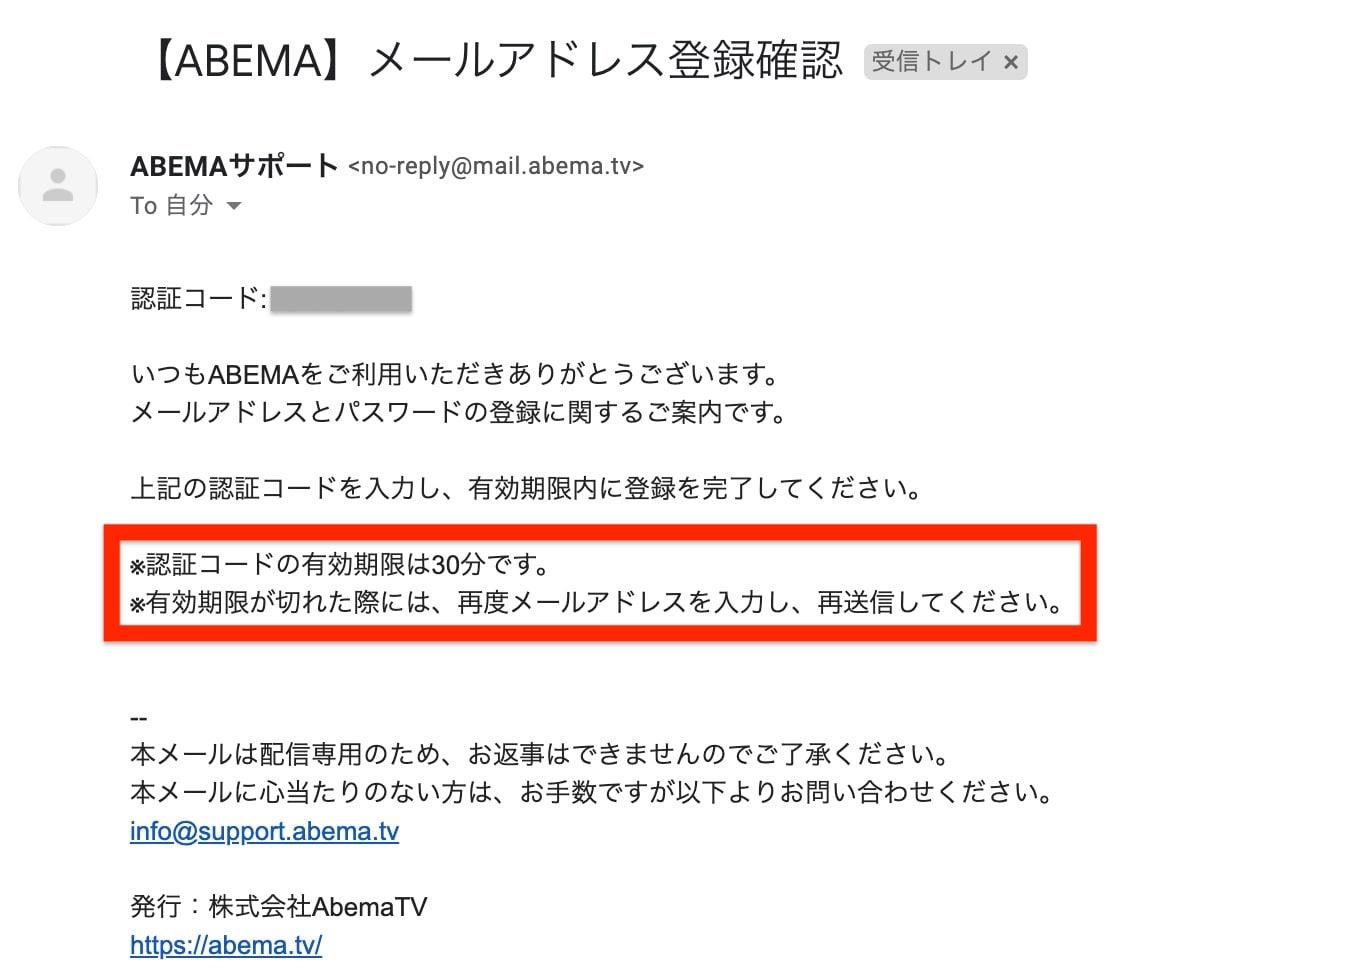 ABEMA|認証コードの確認